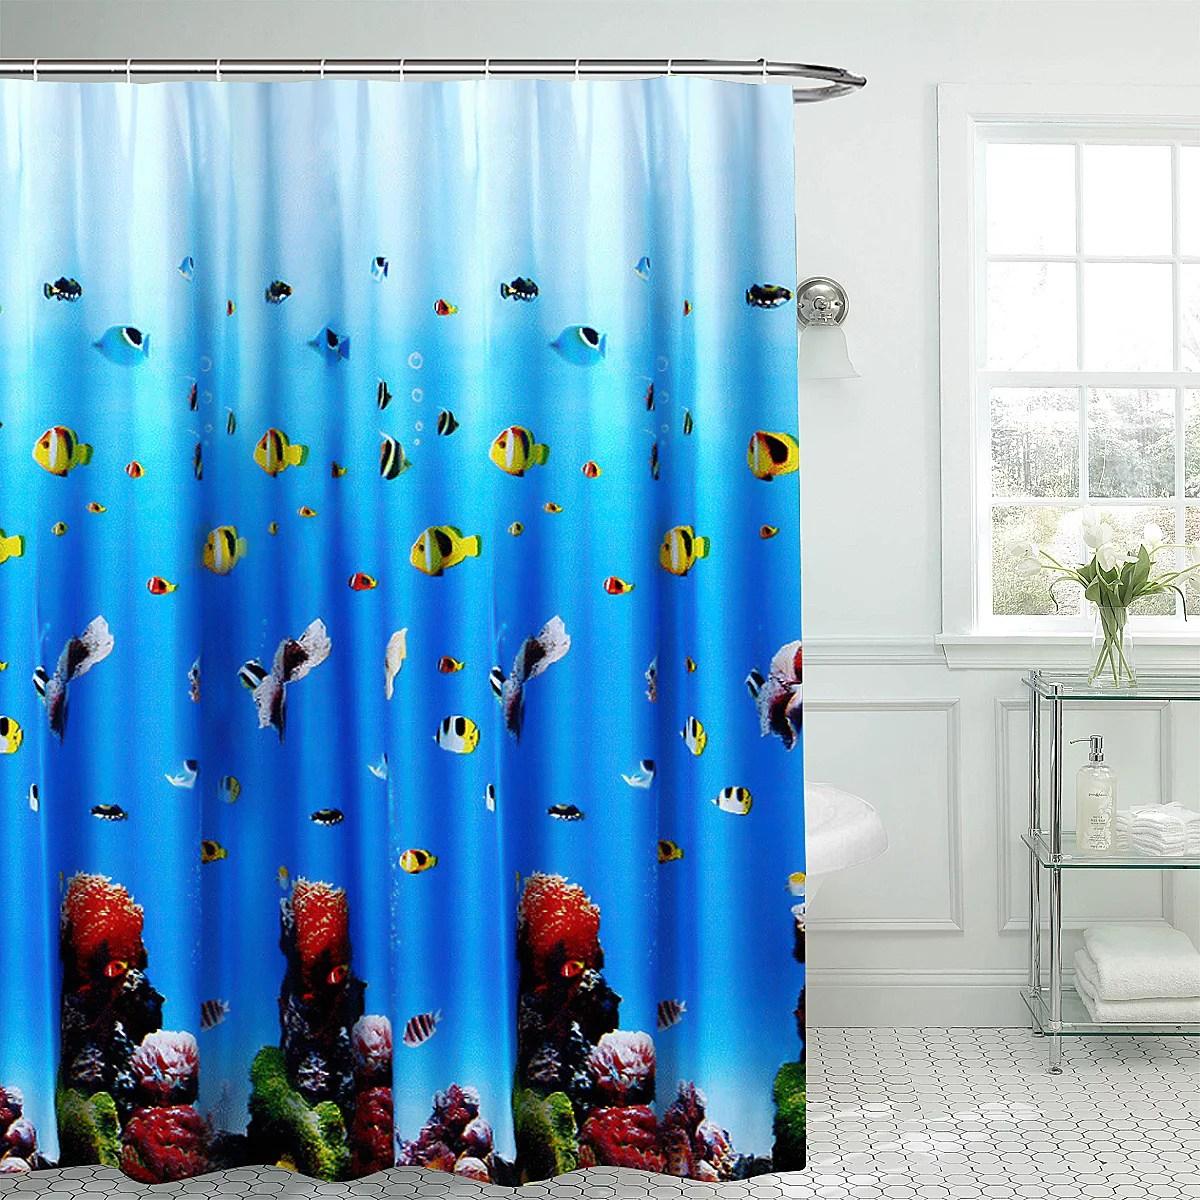 tropical ocean underwater world colorful fish waterproof shower curtain window curtain non slip mats bath carpets toilet seat cover floor mat bathroom